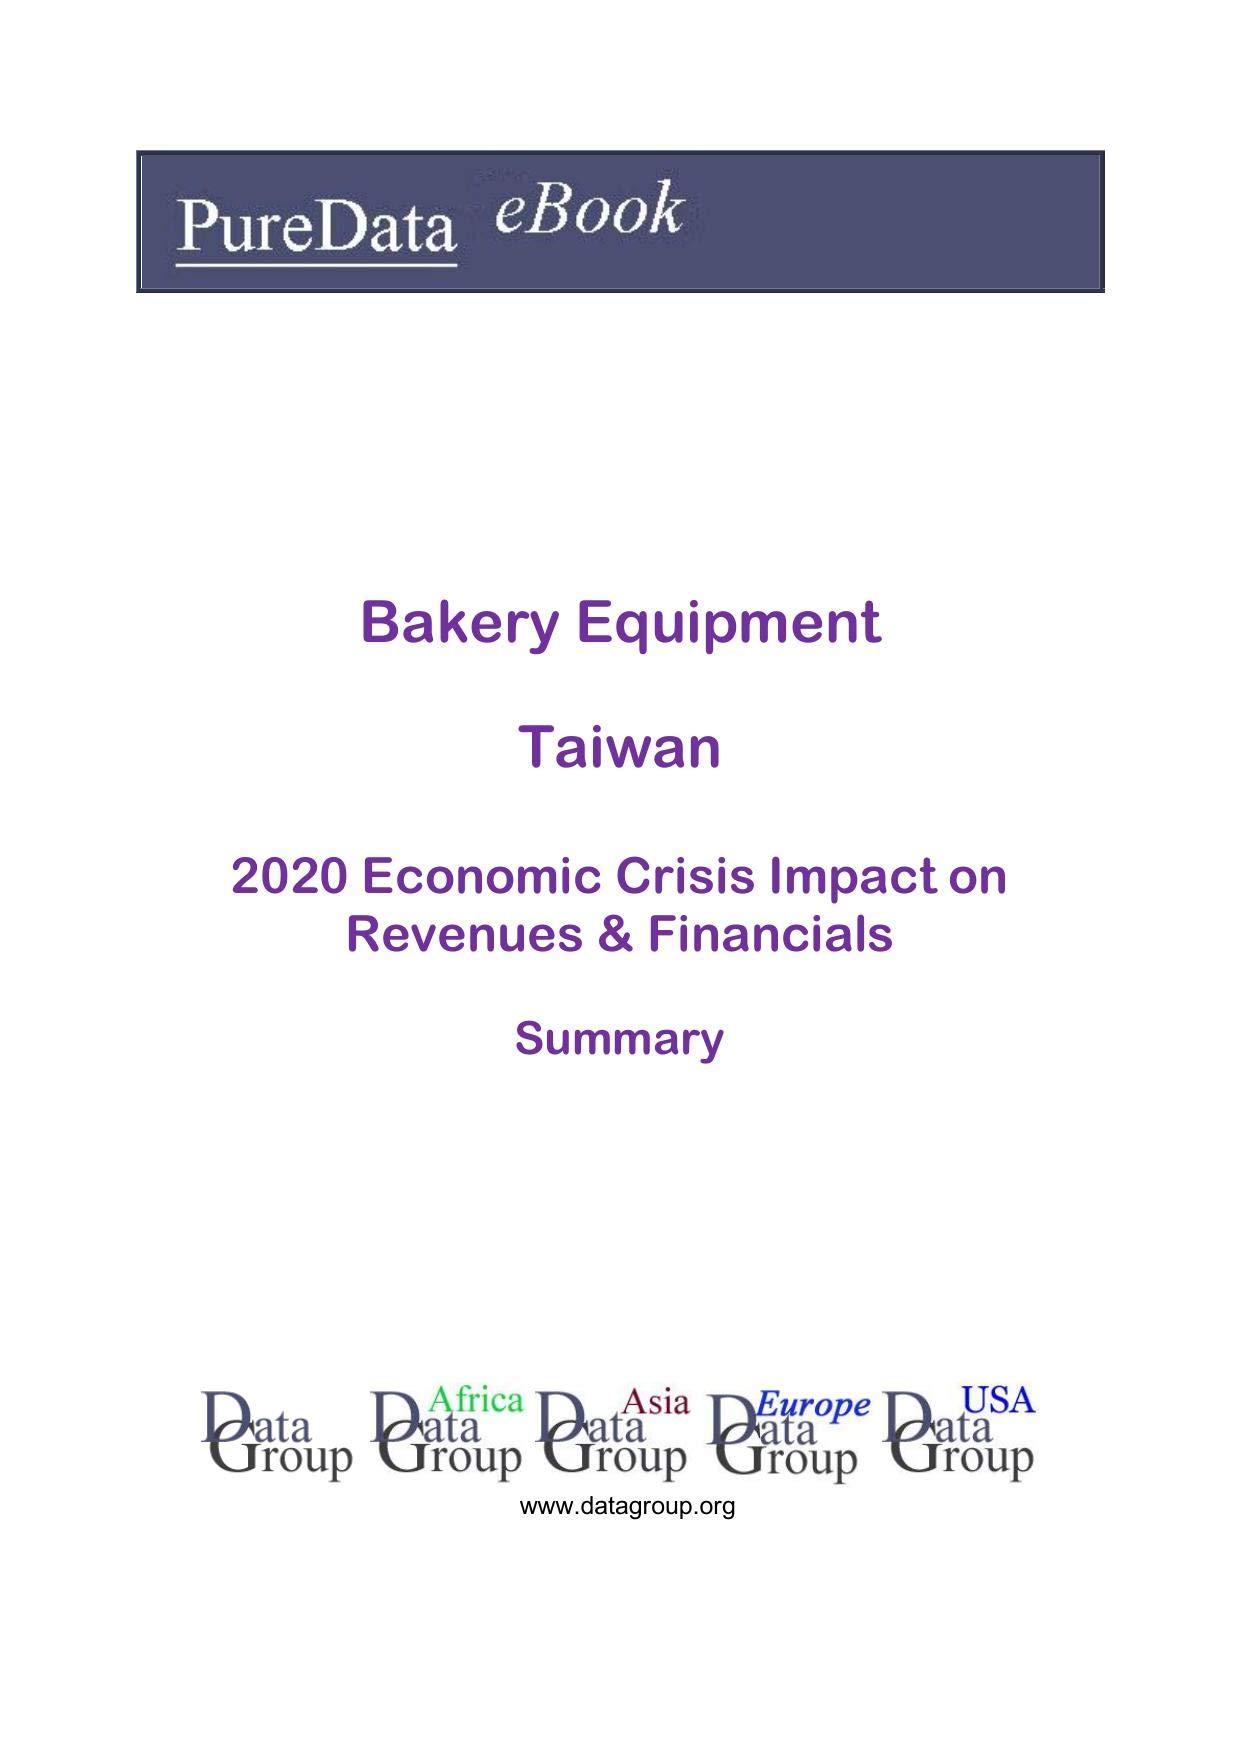 Bakery Equipment Taiwan Summary: 2020 Economic Crisis Impact on Revenues & Financials